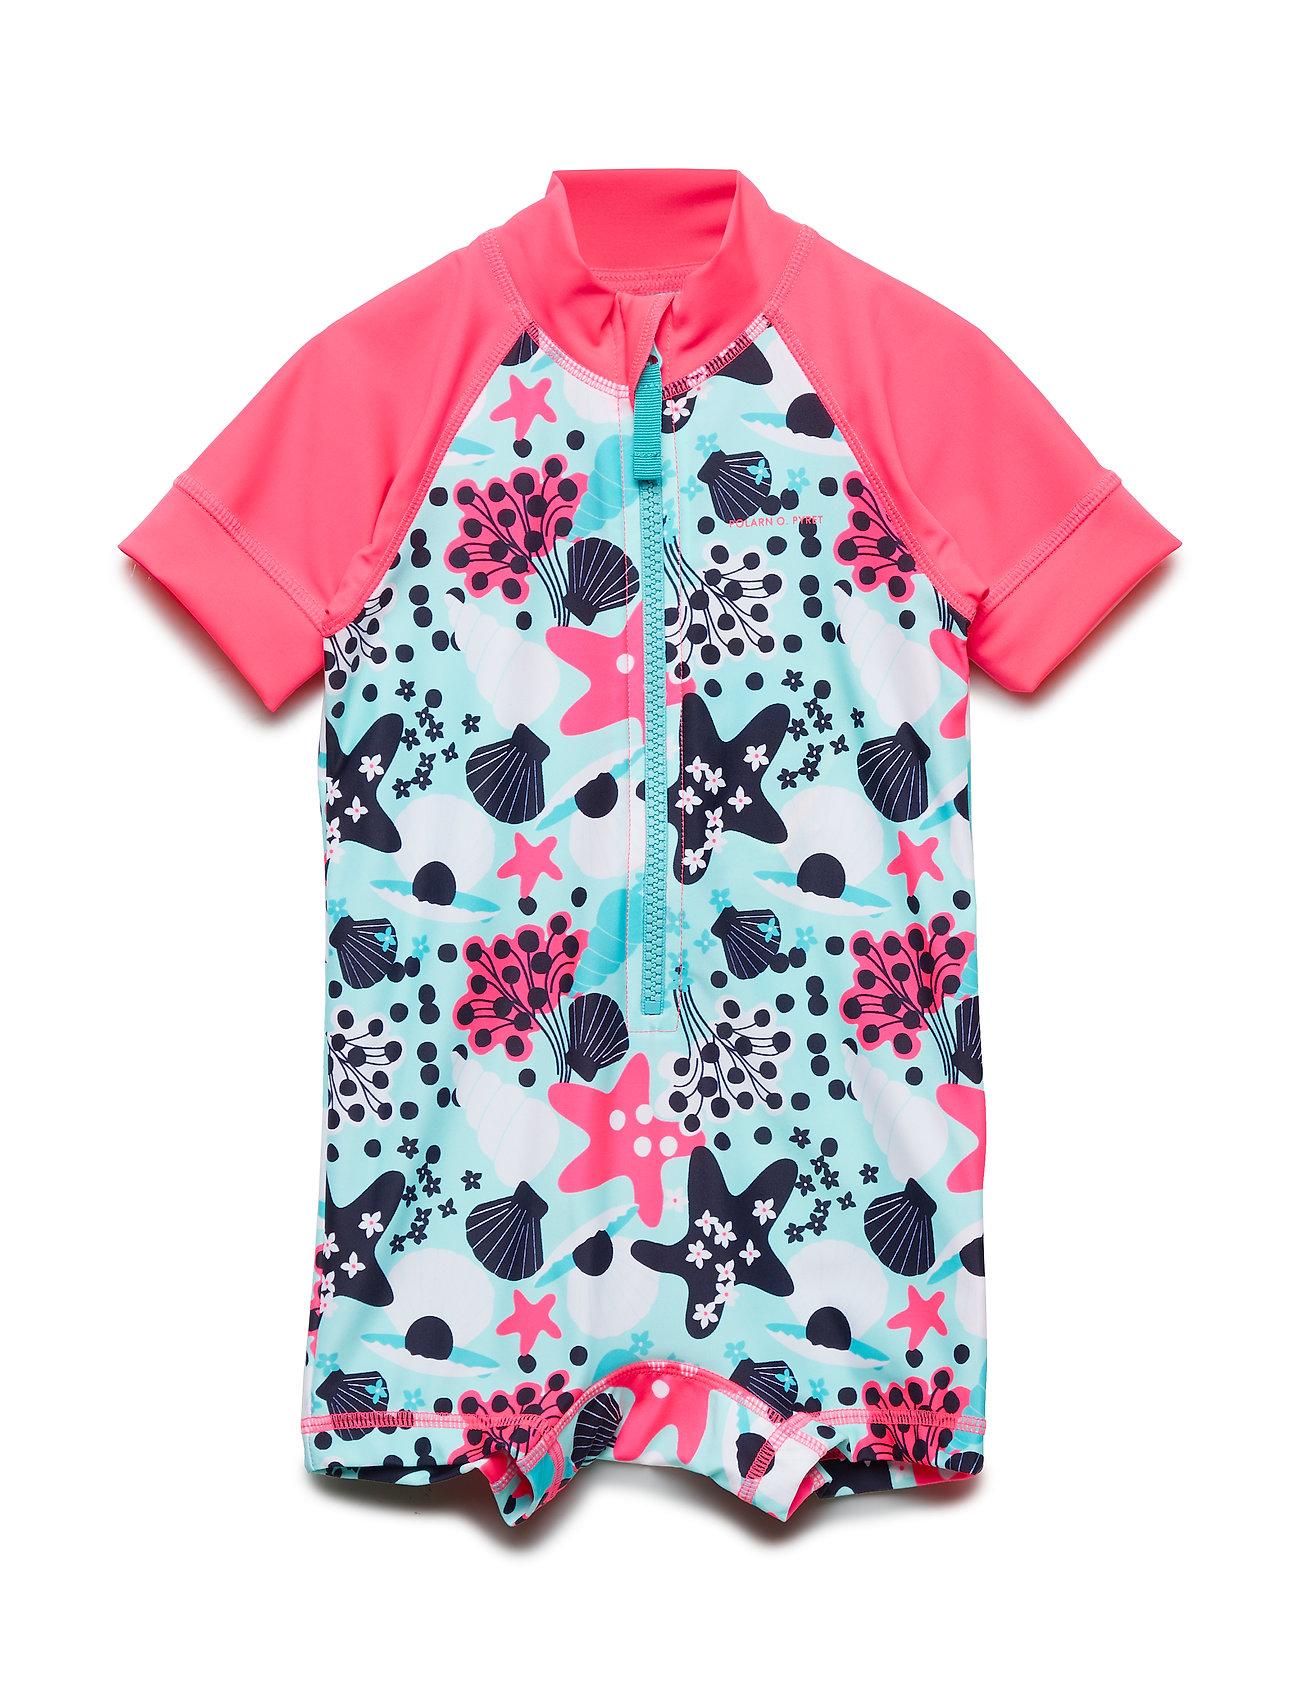 Polarn O. Pyret Swimsuit Short UPF AOP Baby